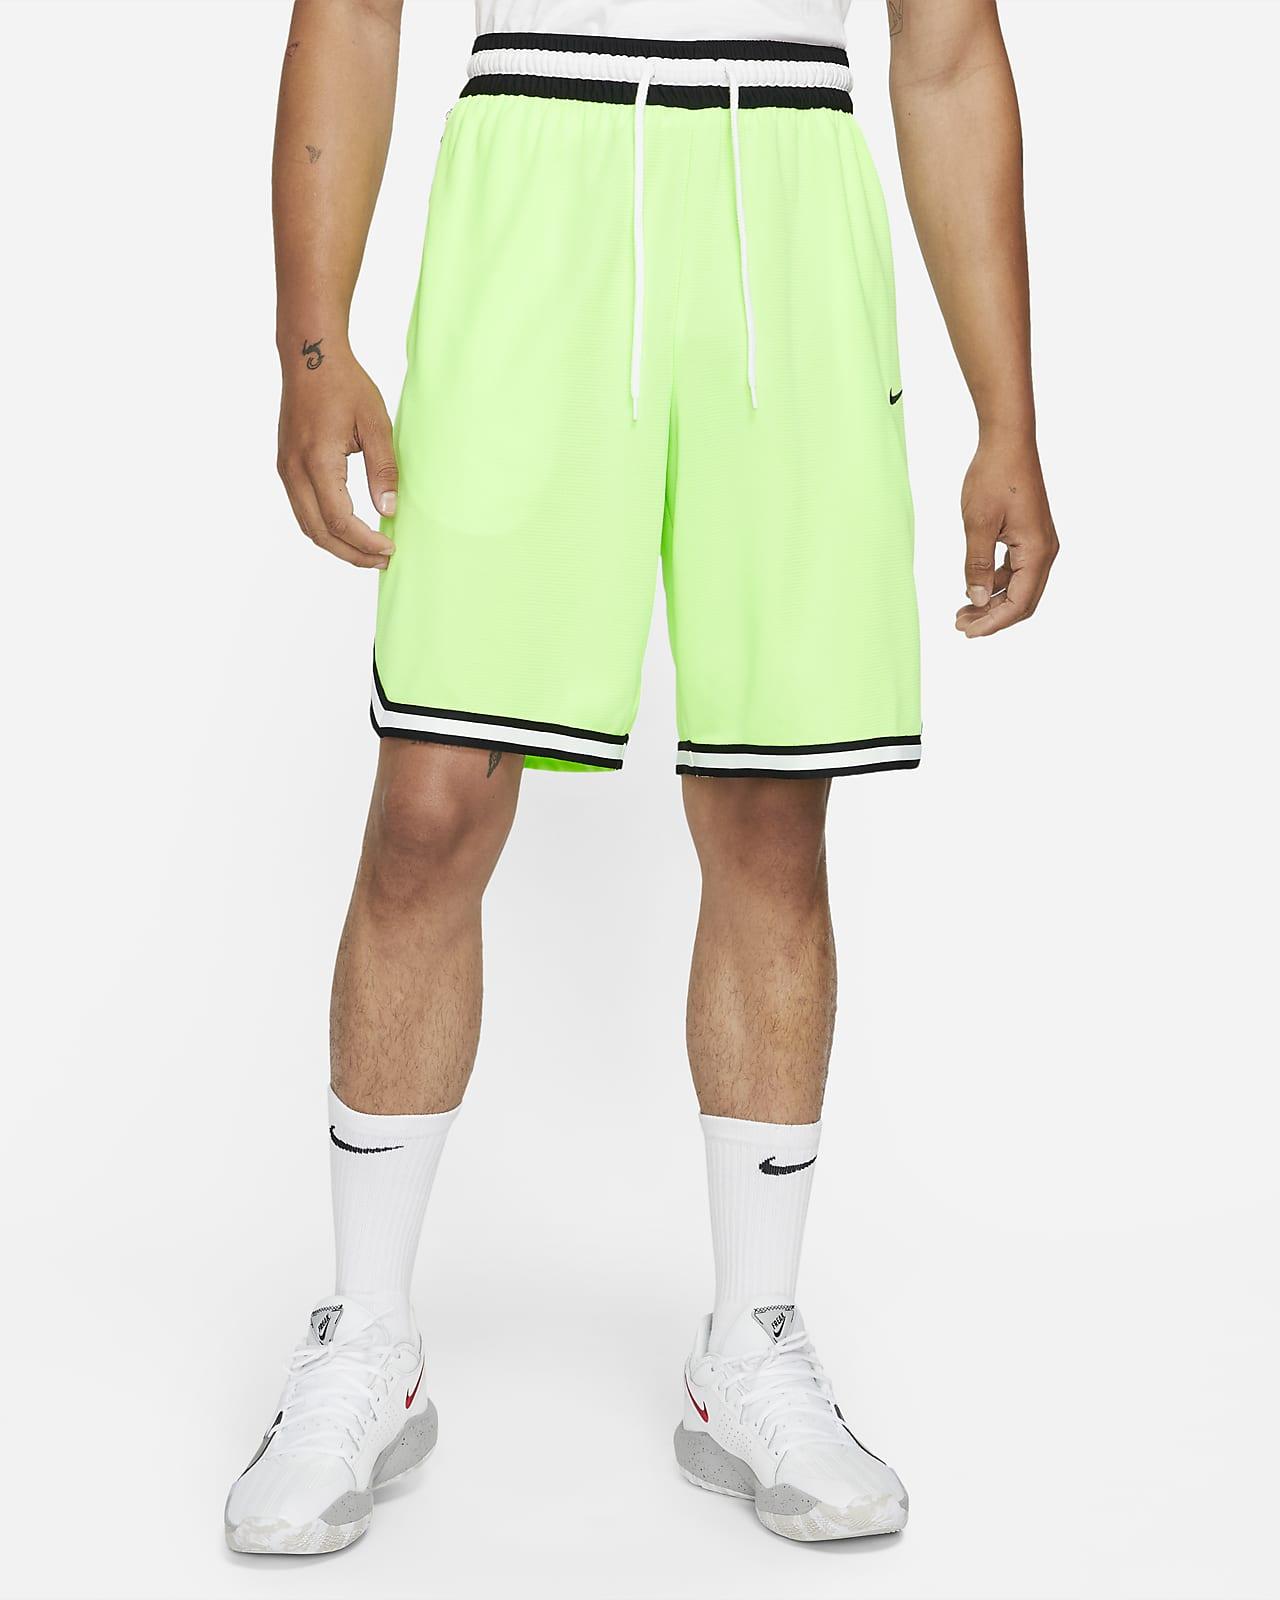 Nike Dri-FIT DNA 3.0 Pantalón corto de baloncesto - Hombre